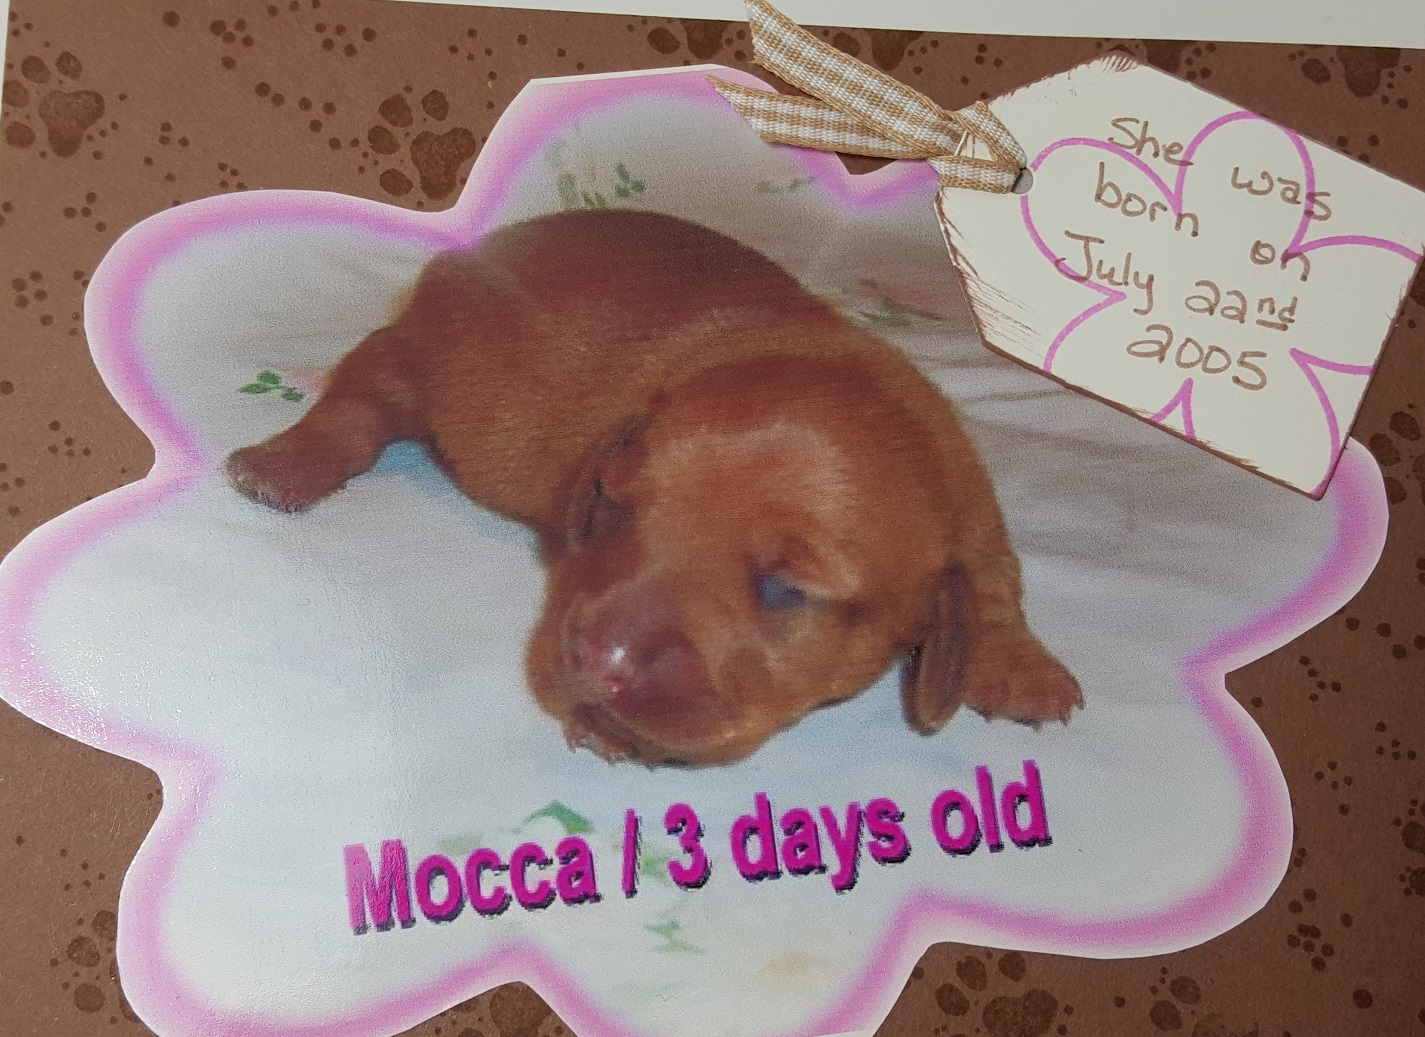 Vicki-Mocca-newborn pup